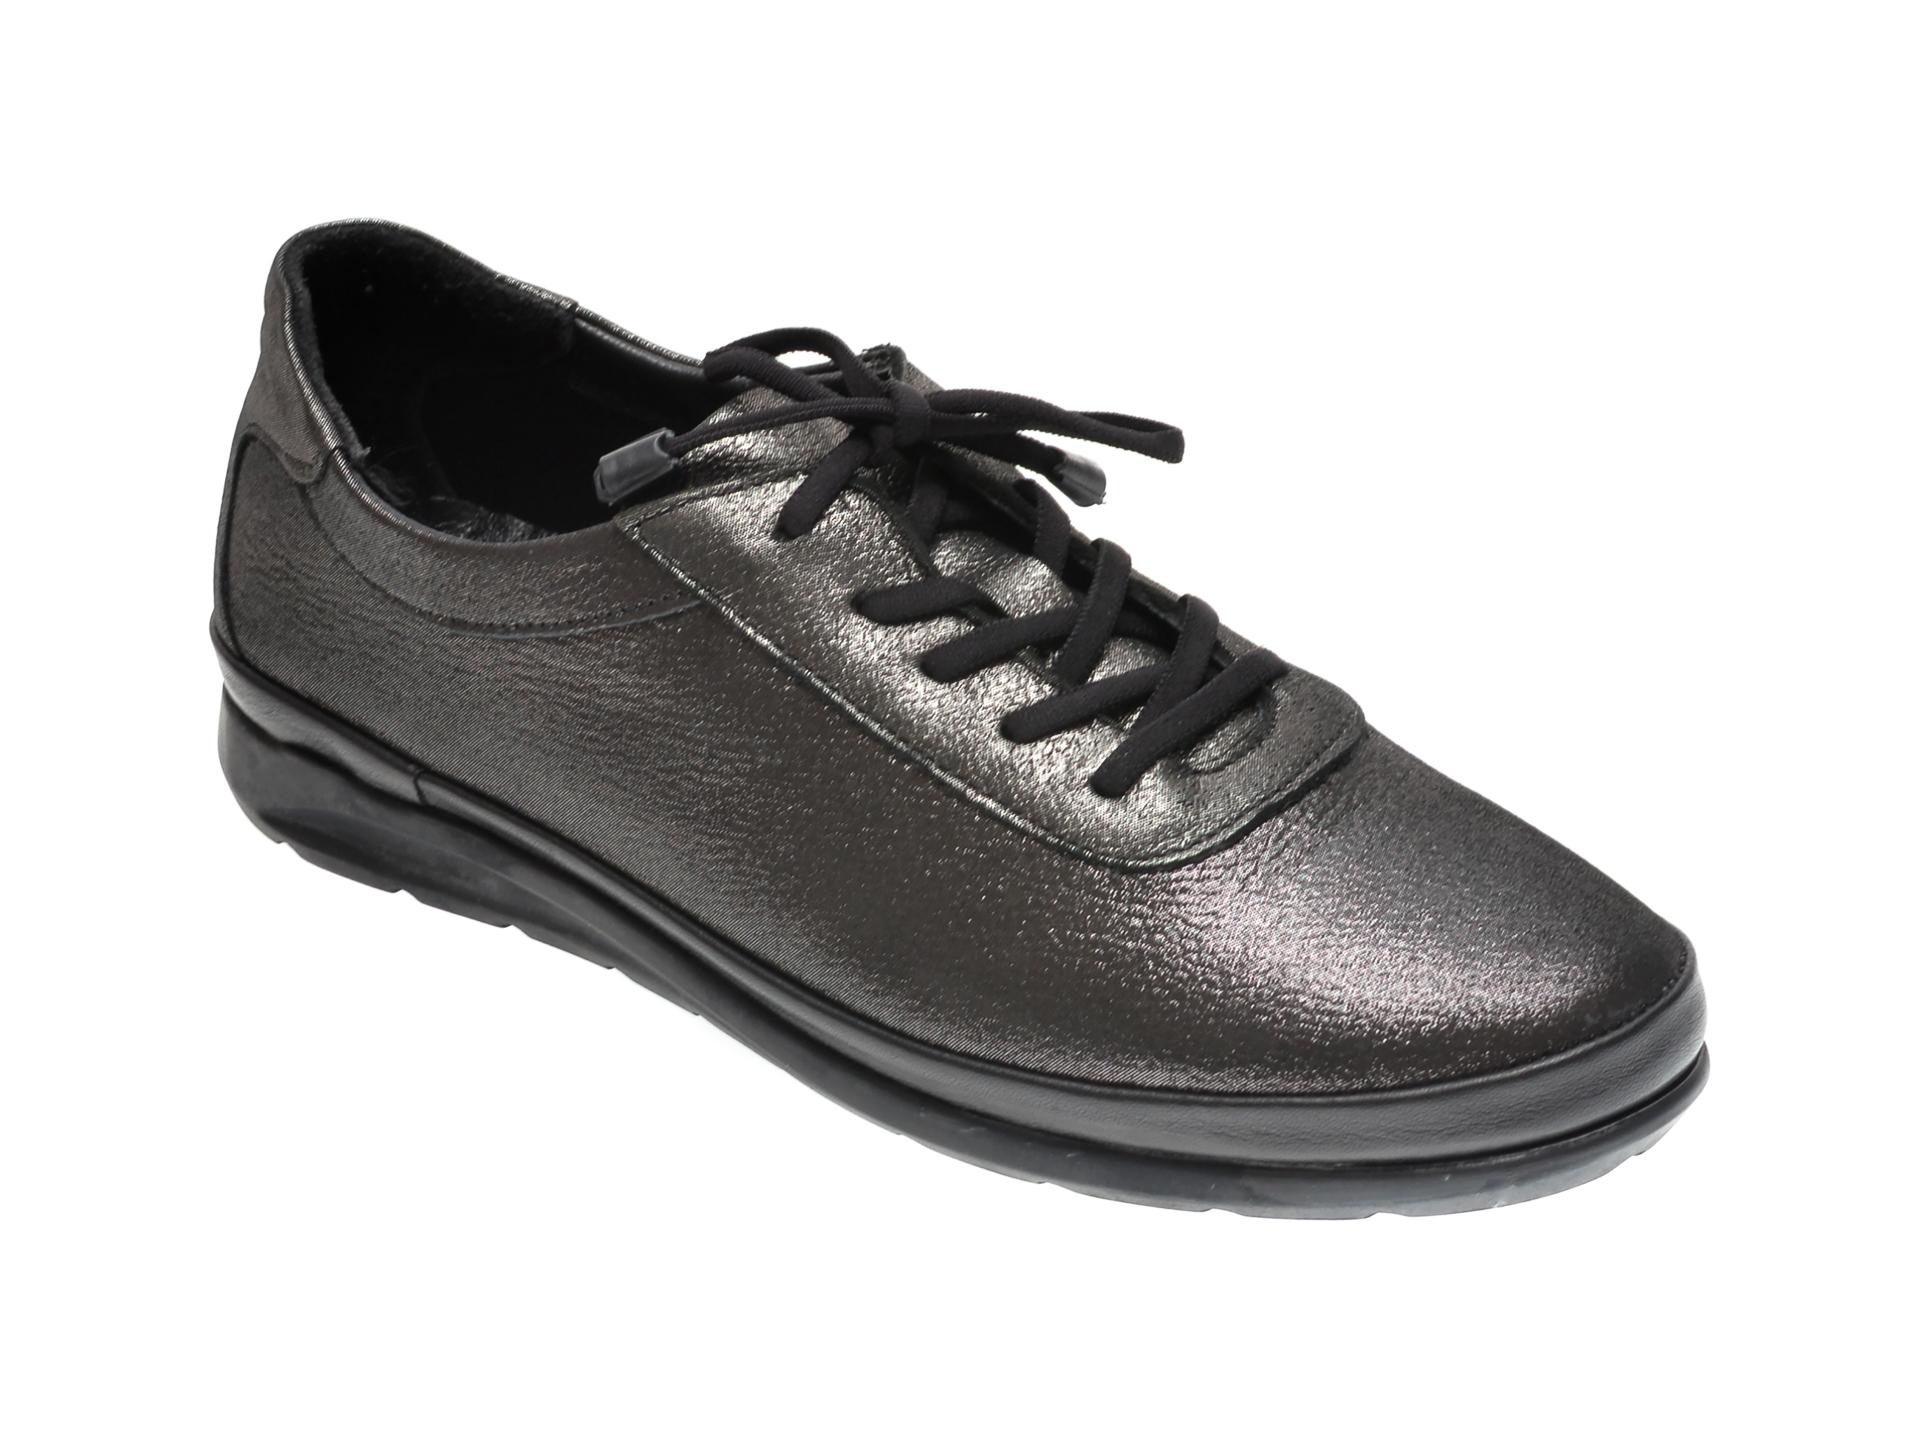 Pantofi Iloz Gri, 6354, Din Piele Naturala